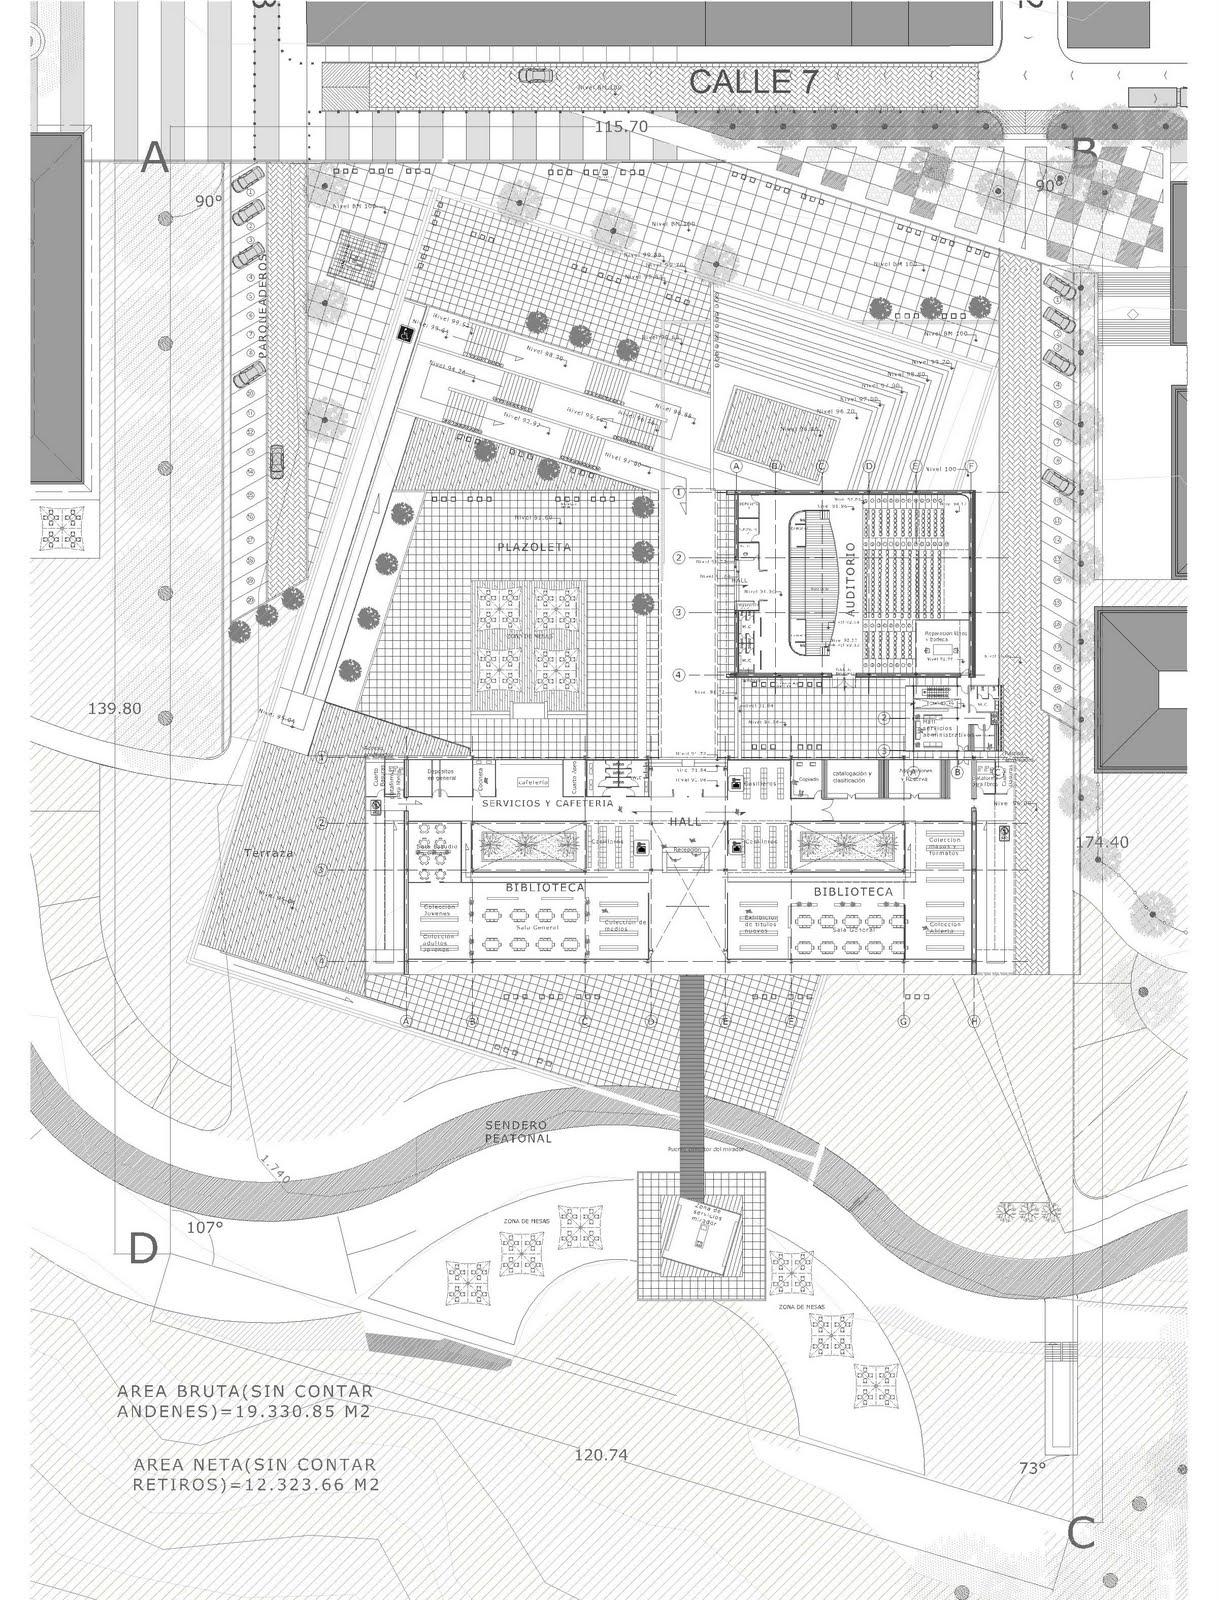 Cavica proyectos de arquitectura biblioteca p blica en for Planta arquitectonica biblioteca